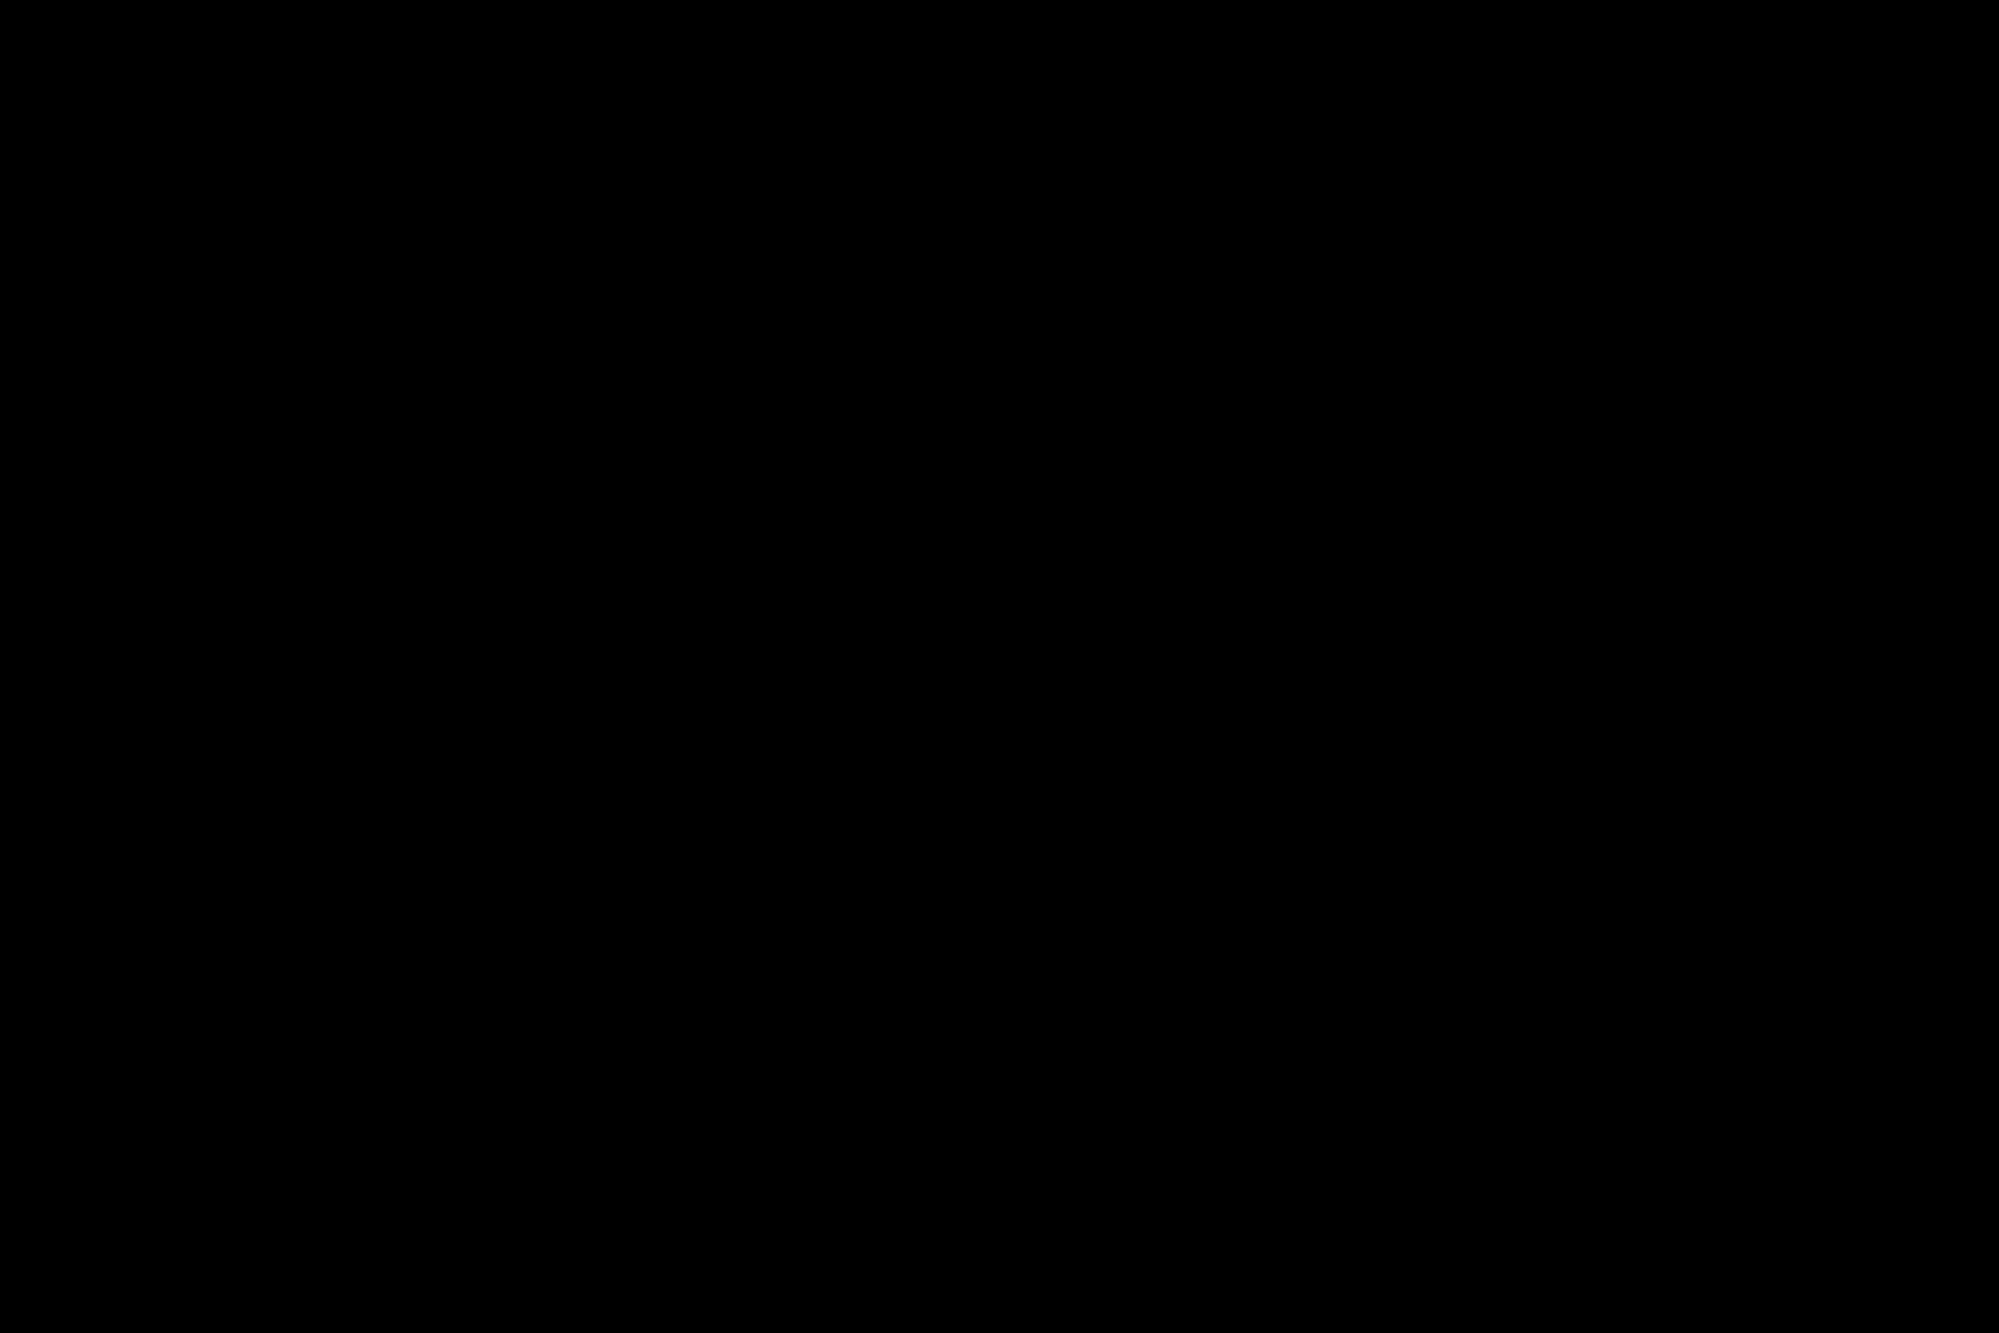 Placa Performa 12,5 (1,20×1,80M)